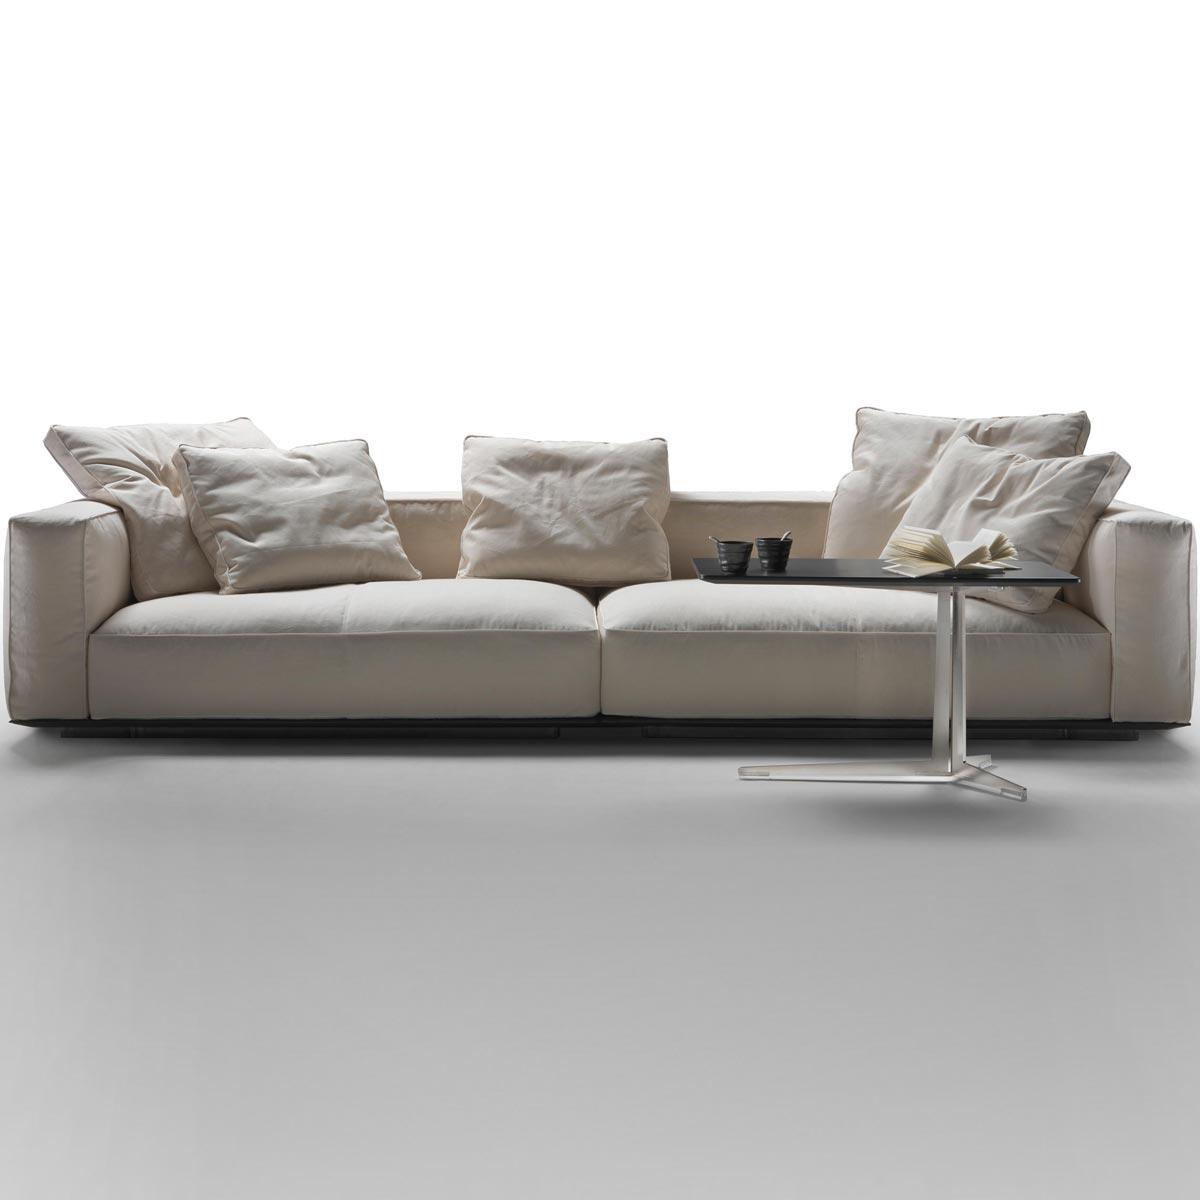 Full Size of Flexform Sofa Bed Uk Furniture Romeo Sale Ebay Eden Gary Winny Groundpiece Preis Lifesteel Cost List Grandemare By Naharro Online Store Big Günstig Sofa Flexform Sofa